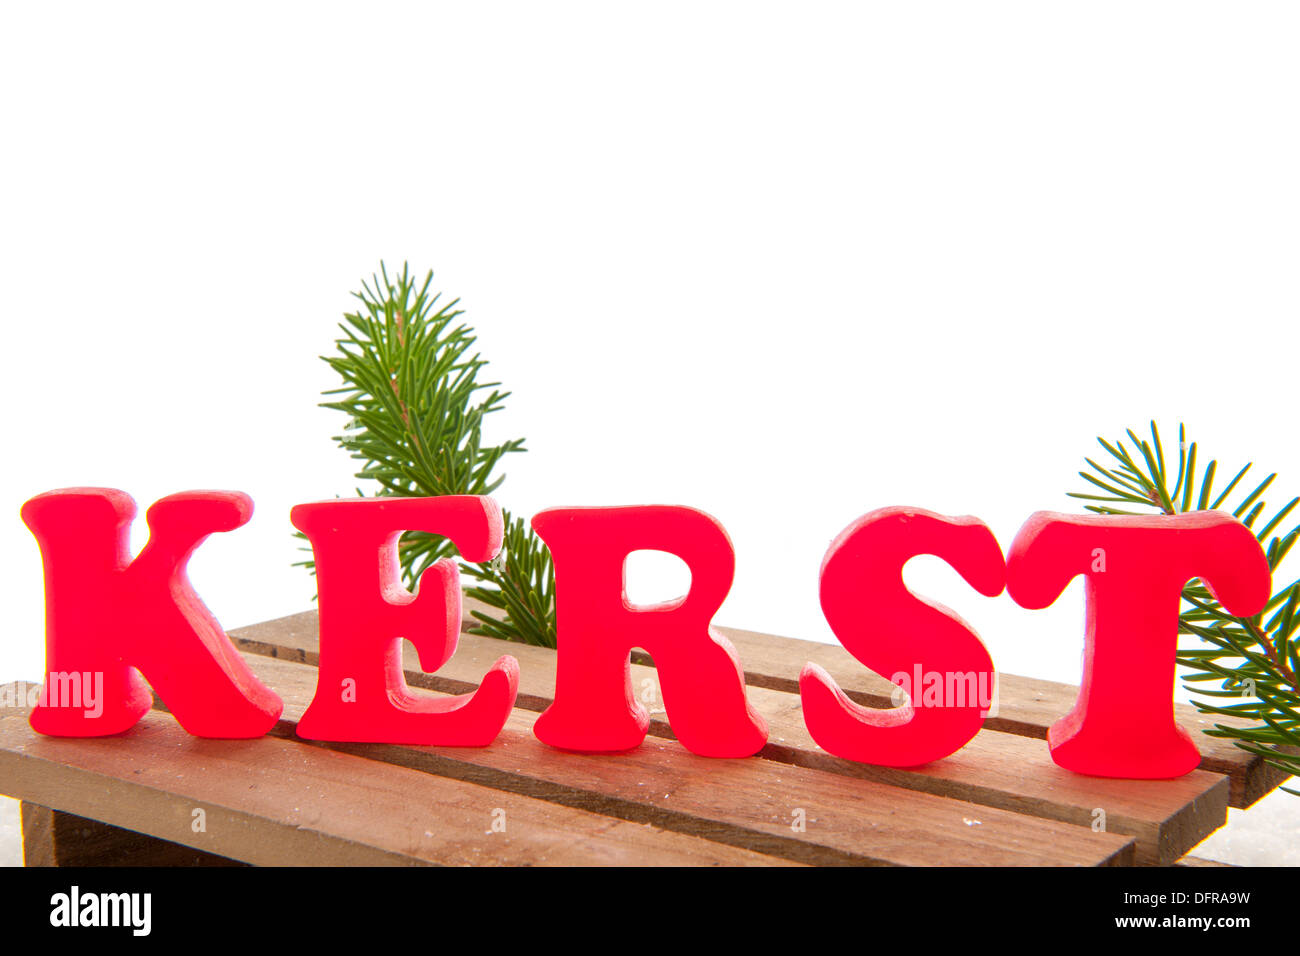 Kerst Stock Photos Kerst Stock Images Alamy